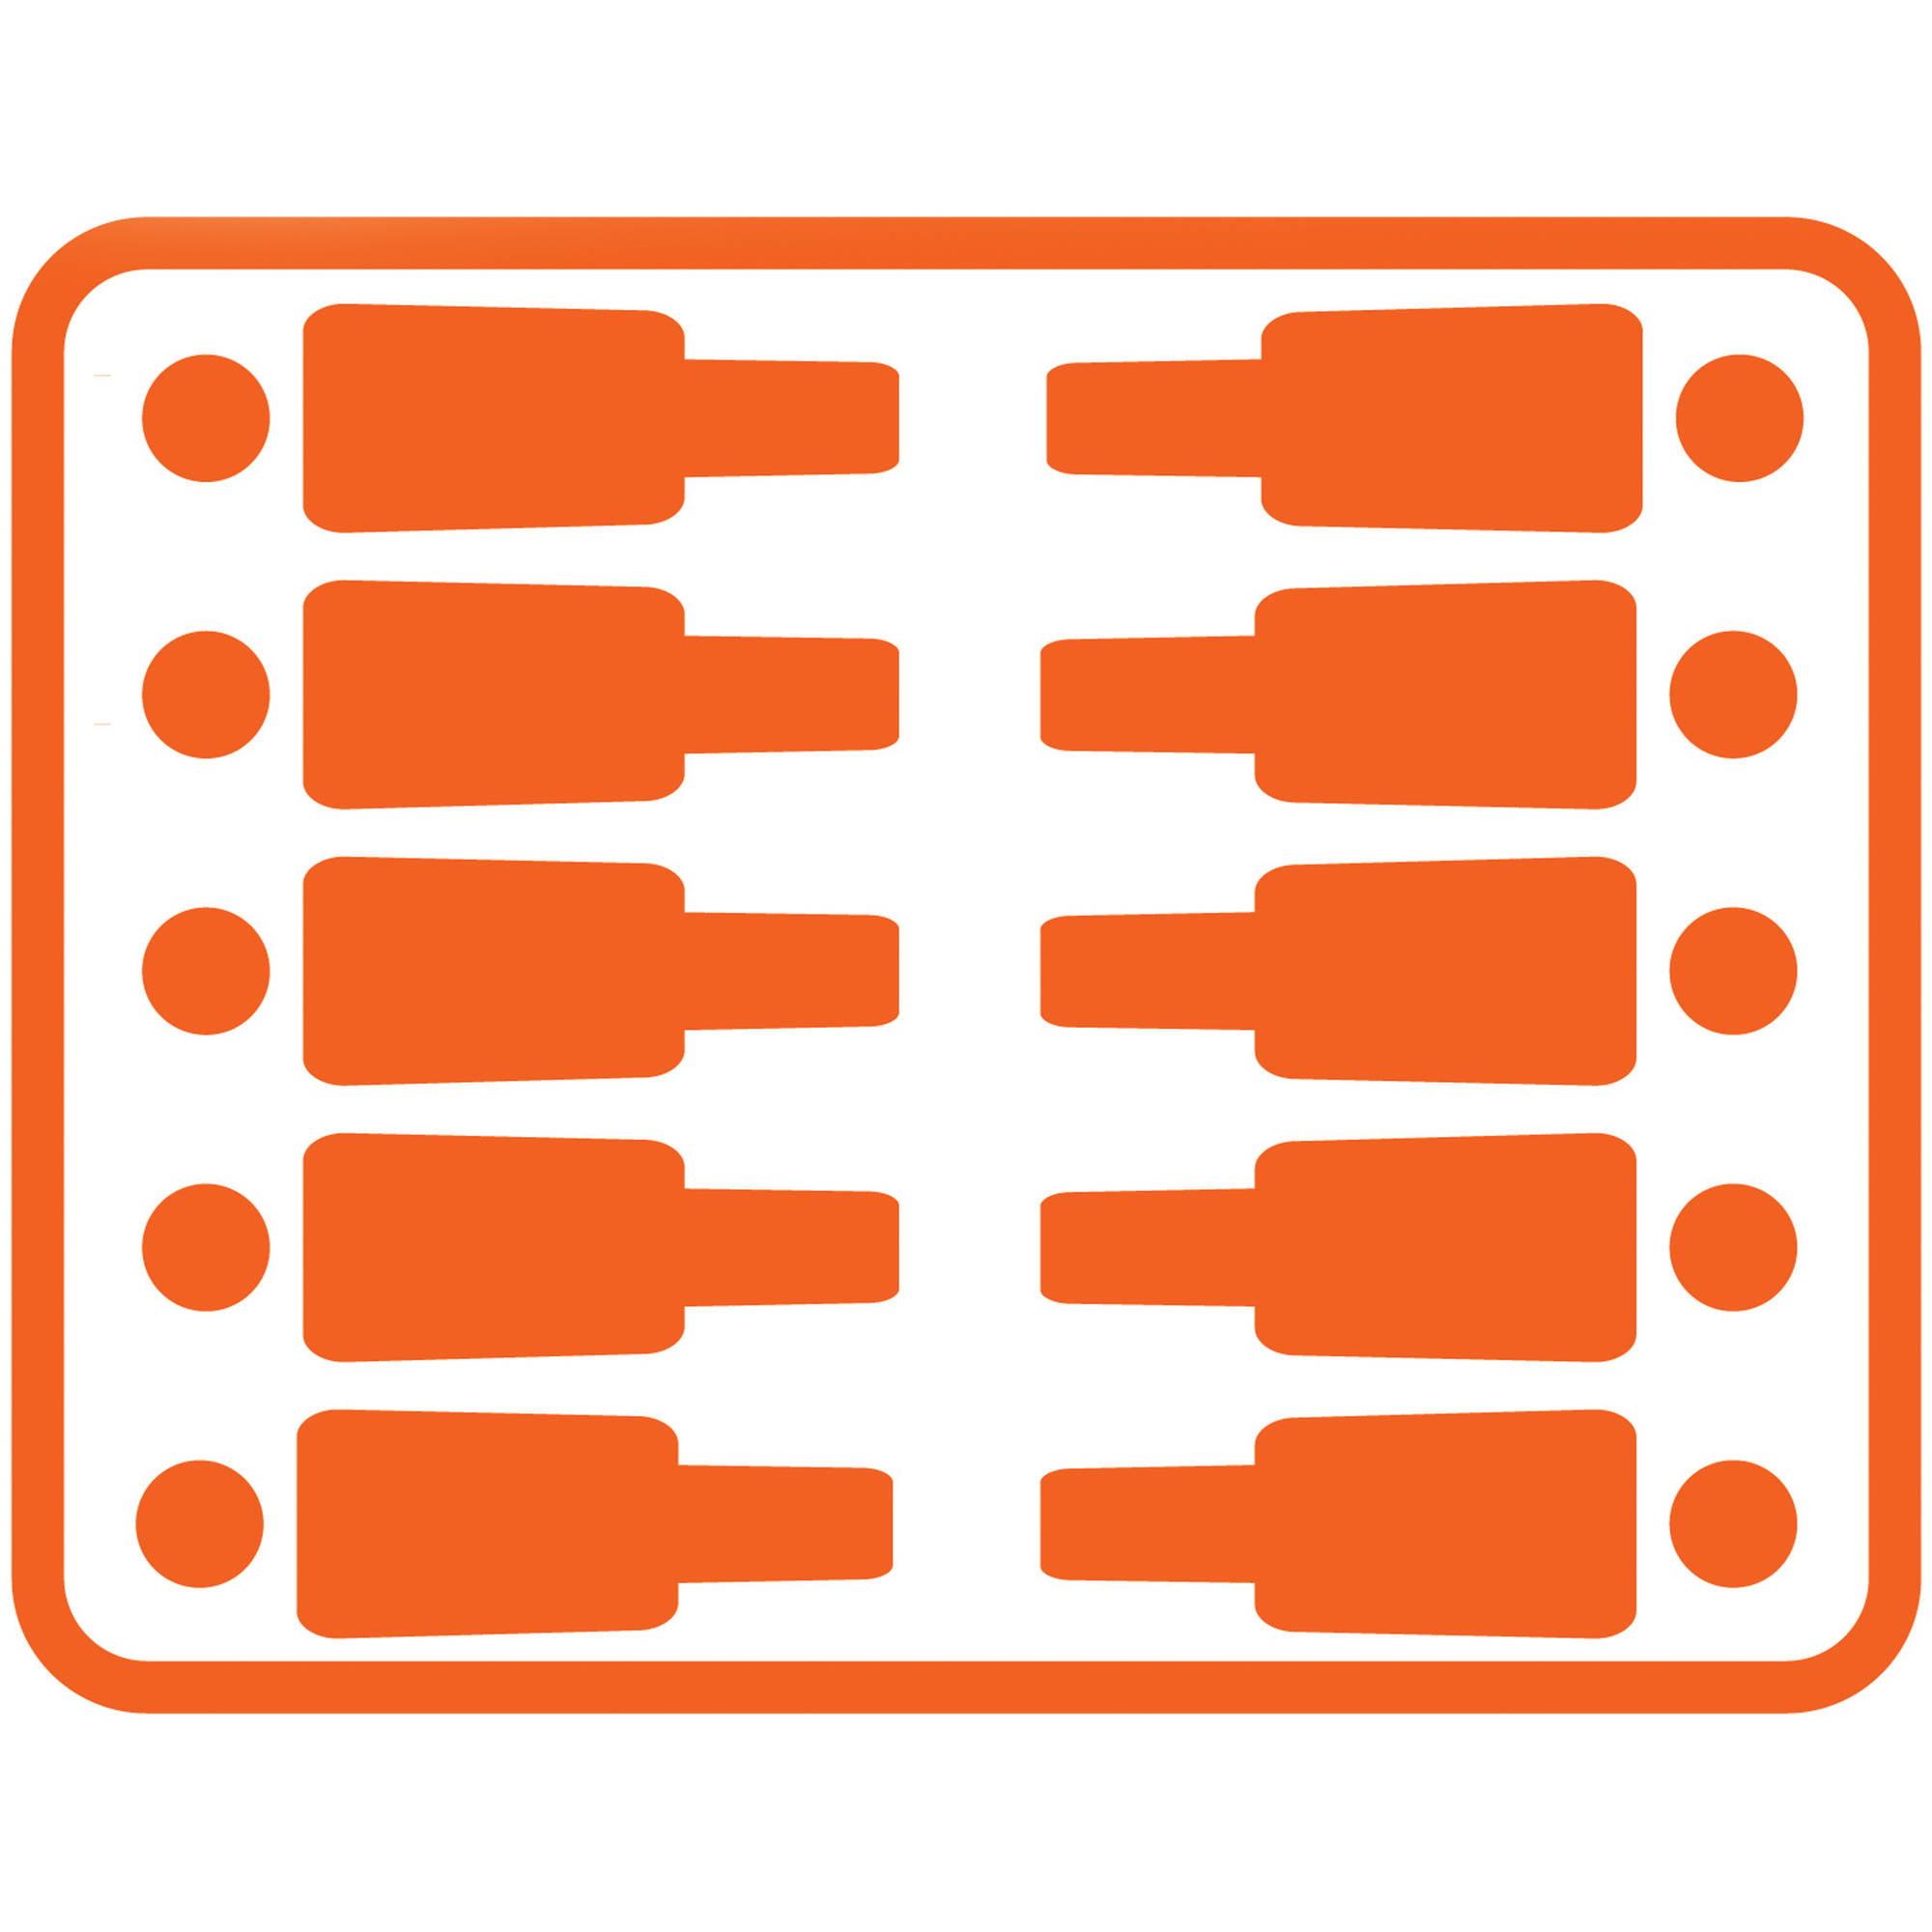 sc 1 st  Walmart & Ozark Trail 14u0027 x 10u0027 Orange Instant Cabin Sleeps 10 - Walmart.com